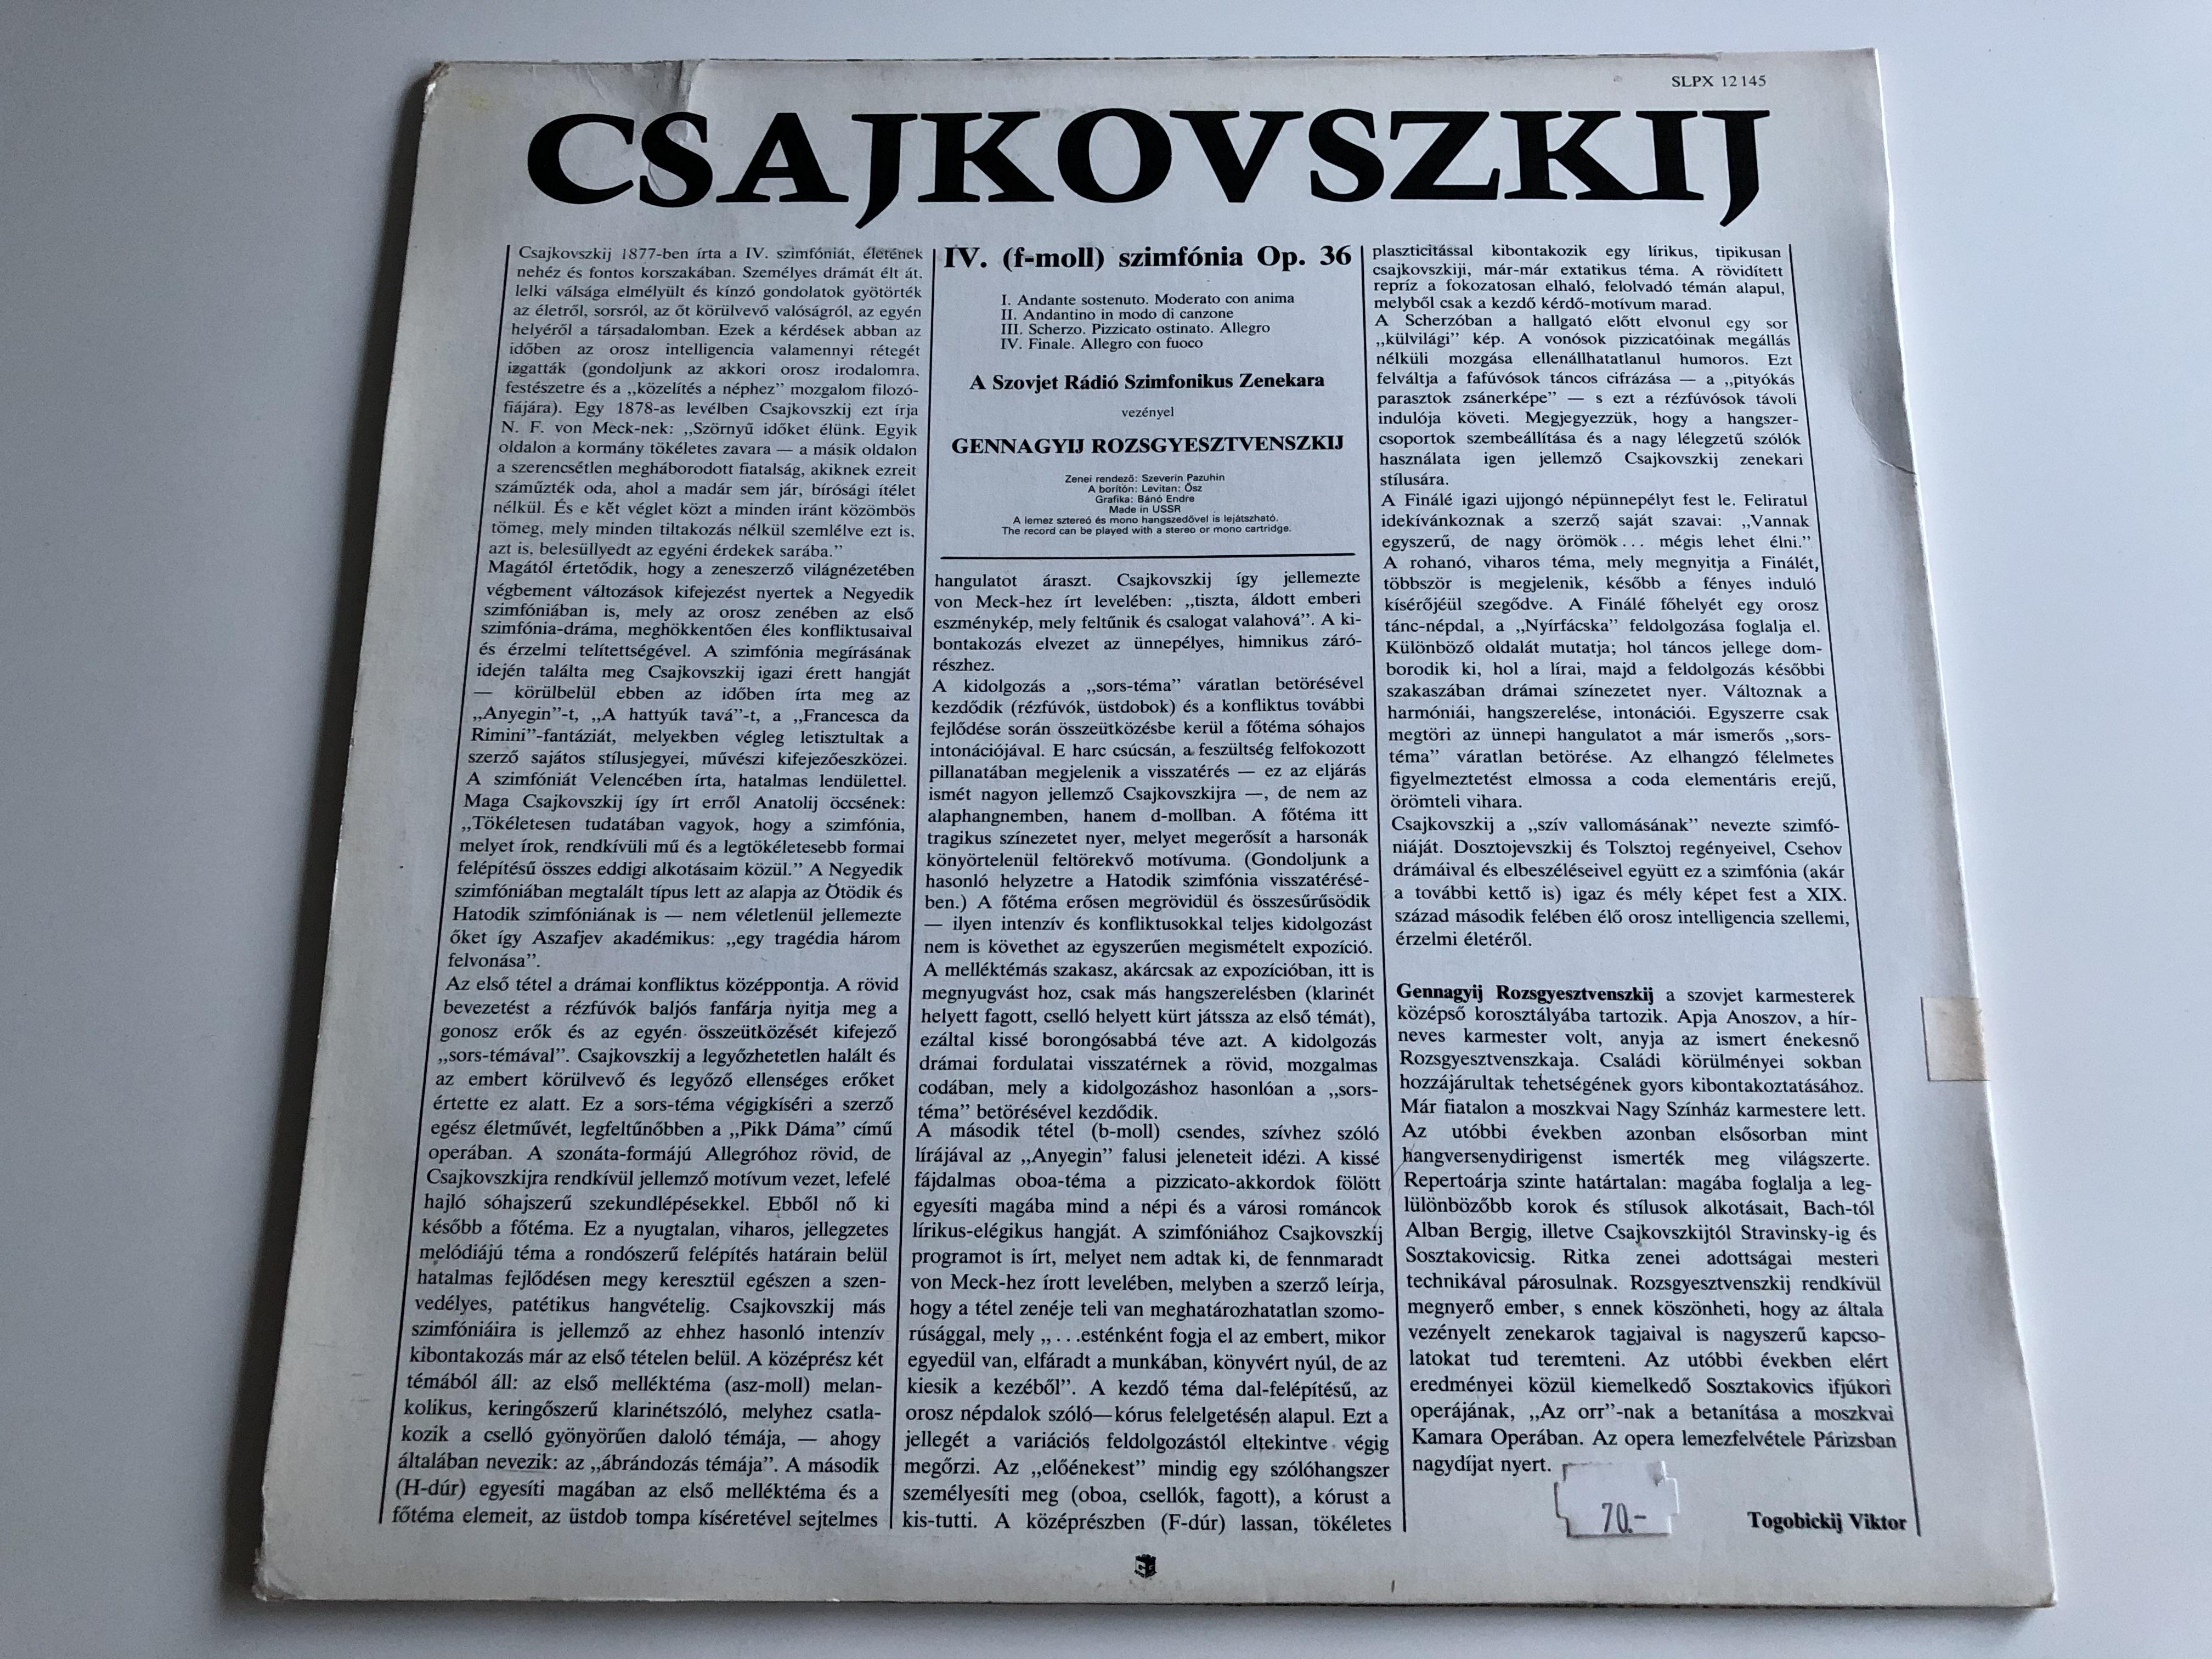 csajkovszkij-iv.-szimf-nia-op.-36-a-szovjet-r-di-szimfonikus-zenekara-gennagyij-rozsgyesztvenszkij-hungaroton-lp-stereo-slpx-12145-3-.jpg